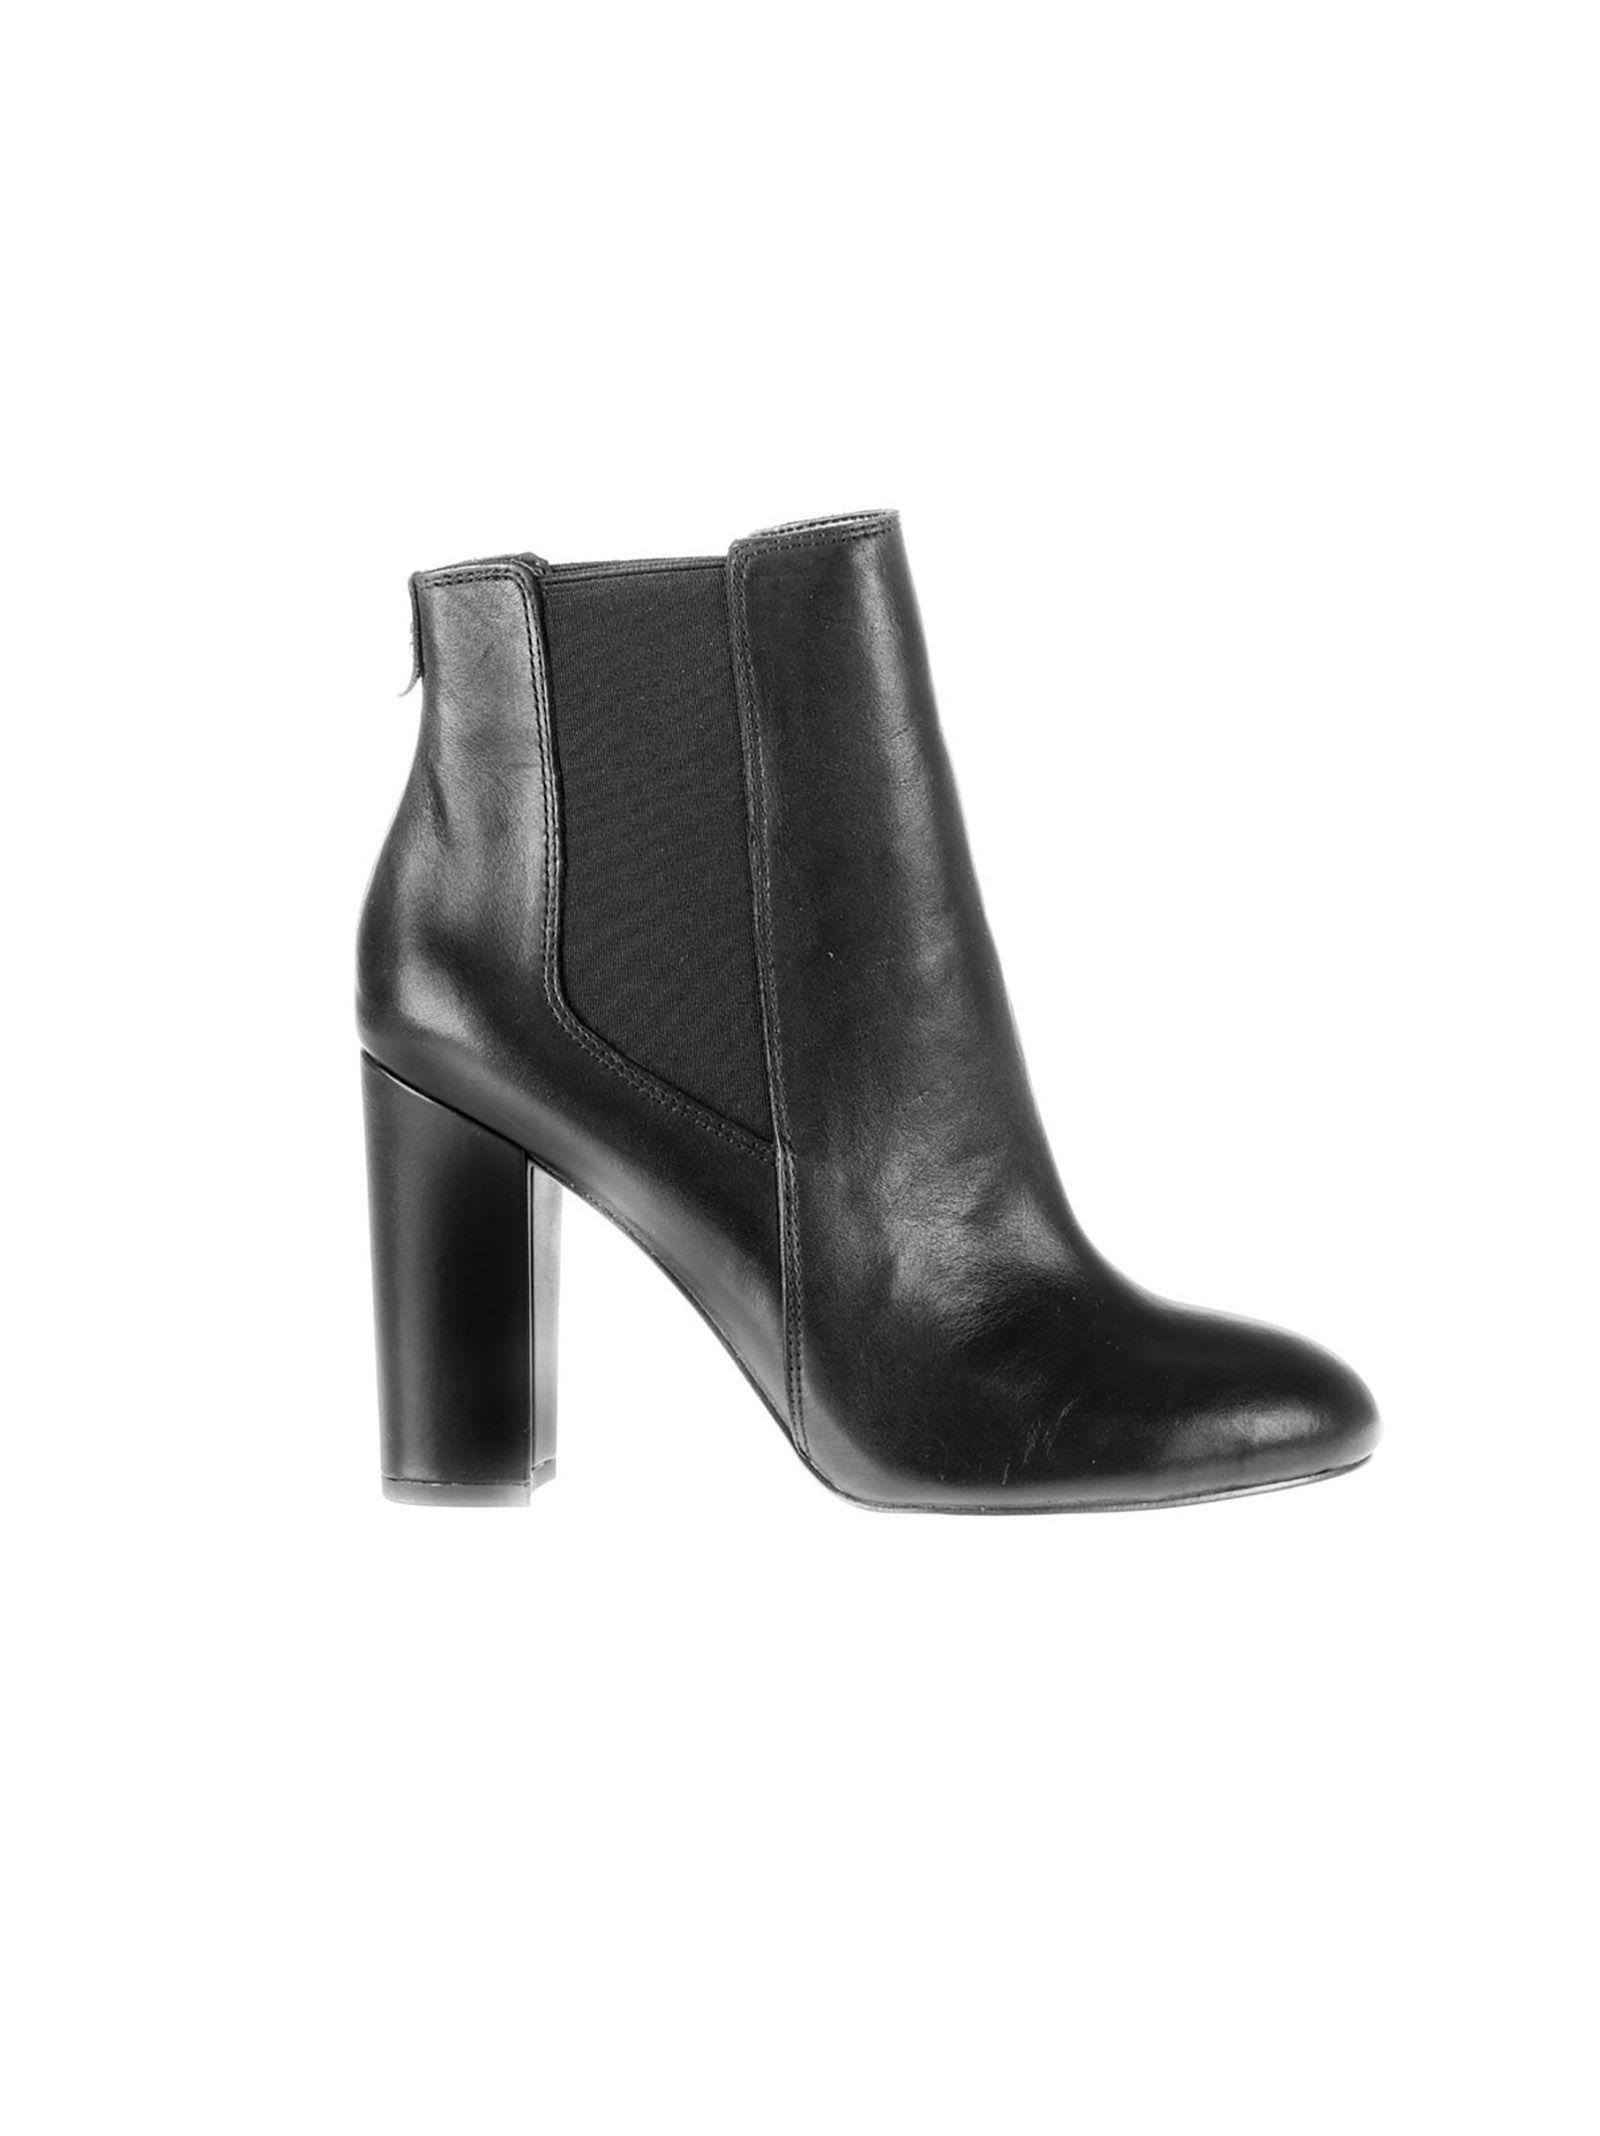 94179684804050 Sam Edelman Sam Edelman Case Ankle Boots - Black - 8426530